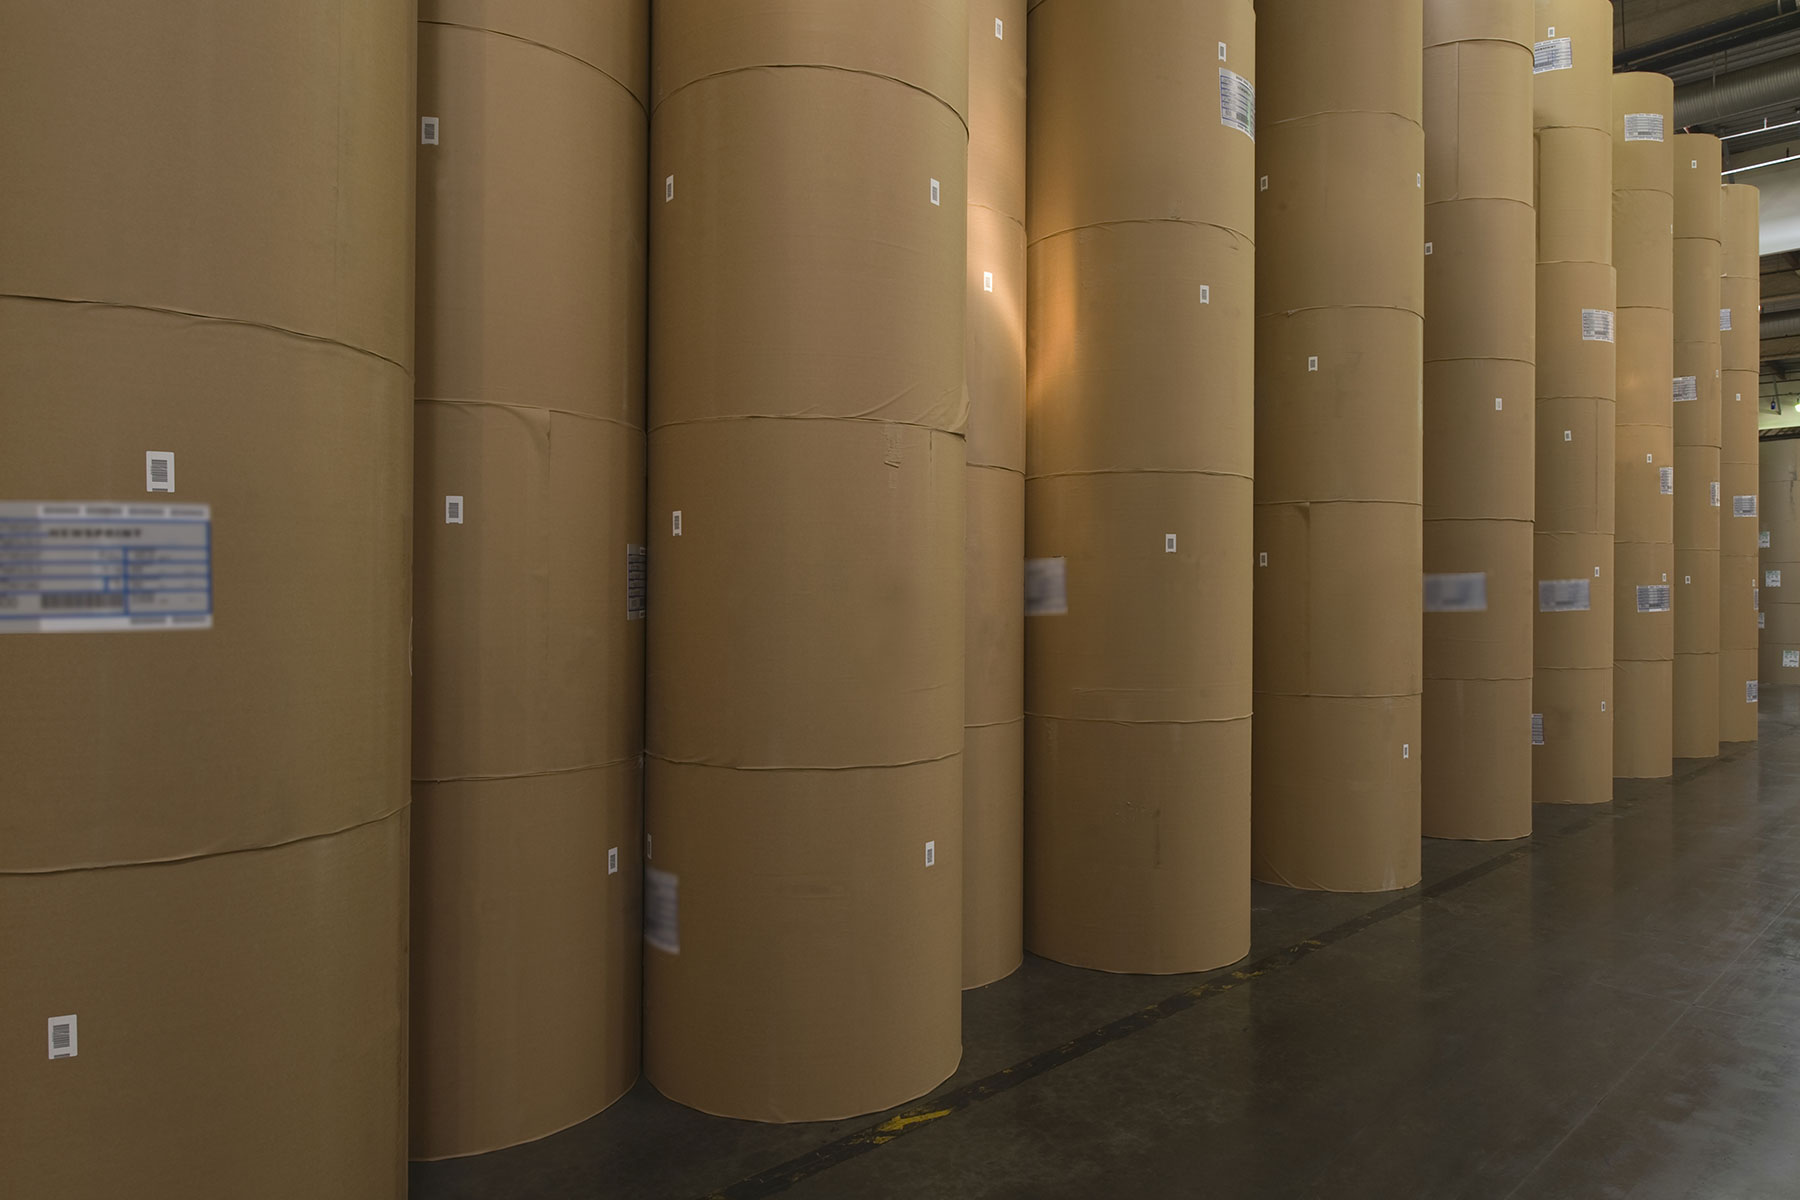 Neupack stocking facilities